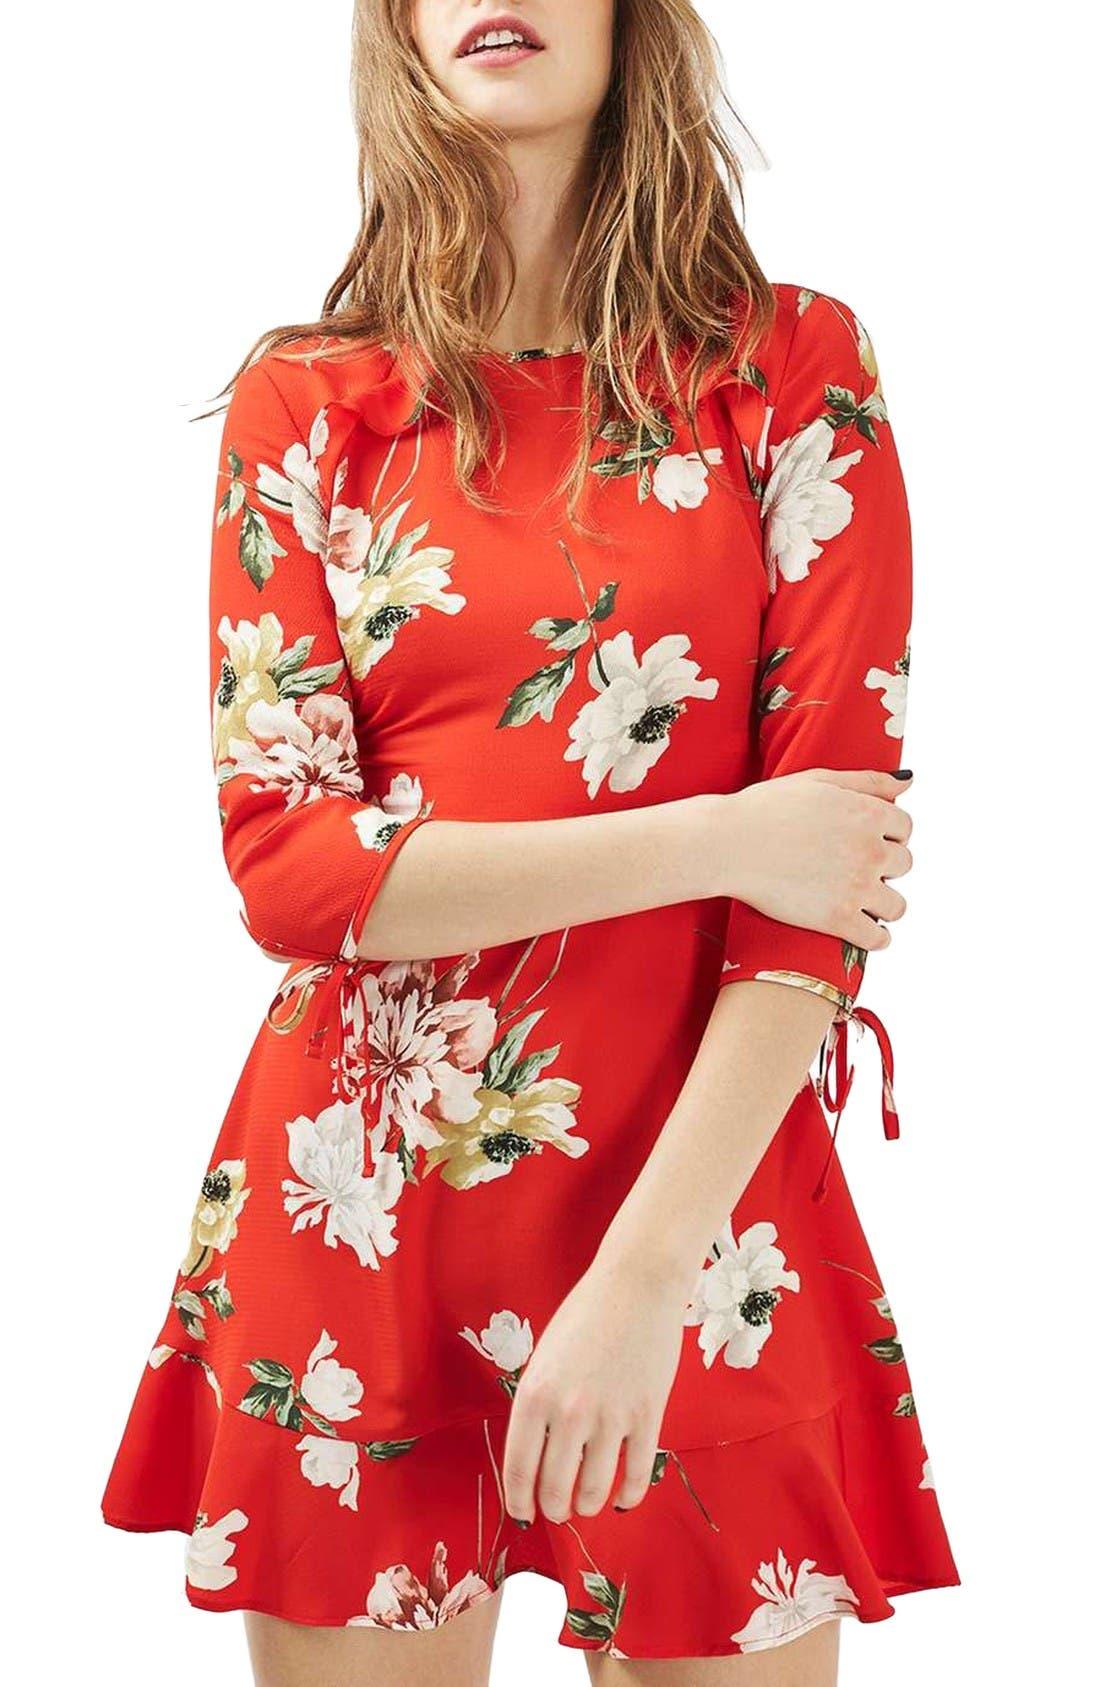 Ruffle Floral Tea Dress,                             Main thumbnail 1, color,                             Red Multi